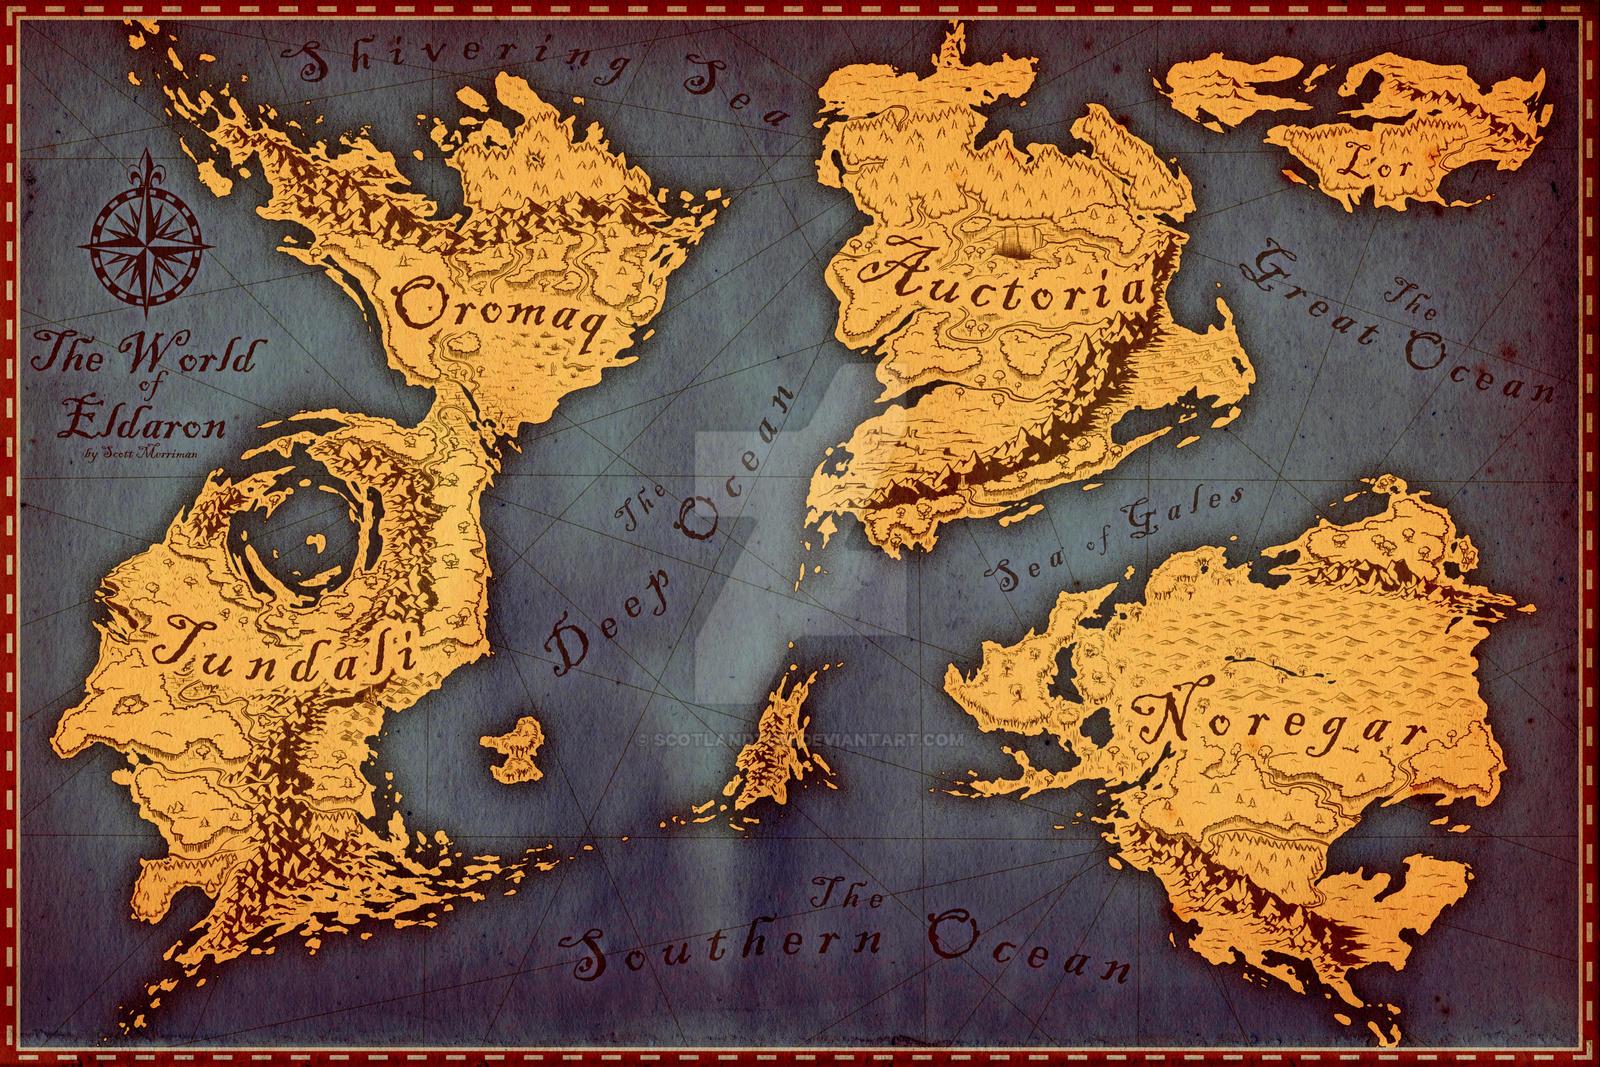 The world of eldaron by scotlandtom on deviantart the world of eldaron by scotlandtom the world of eldaron by scotlandtom gumiabroncs Choice Image